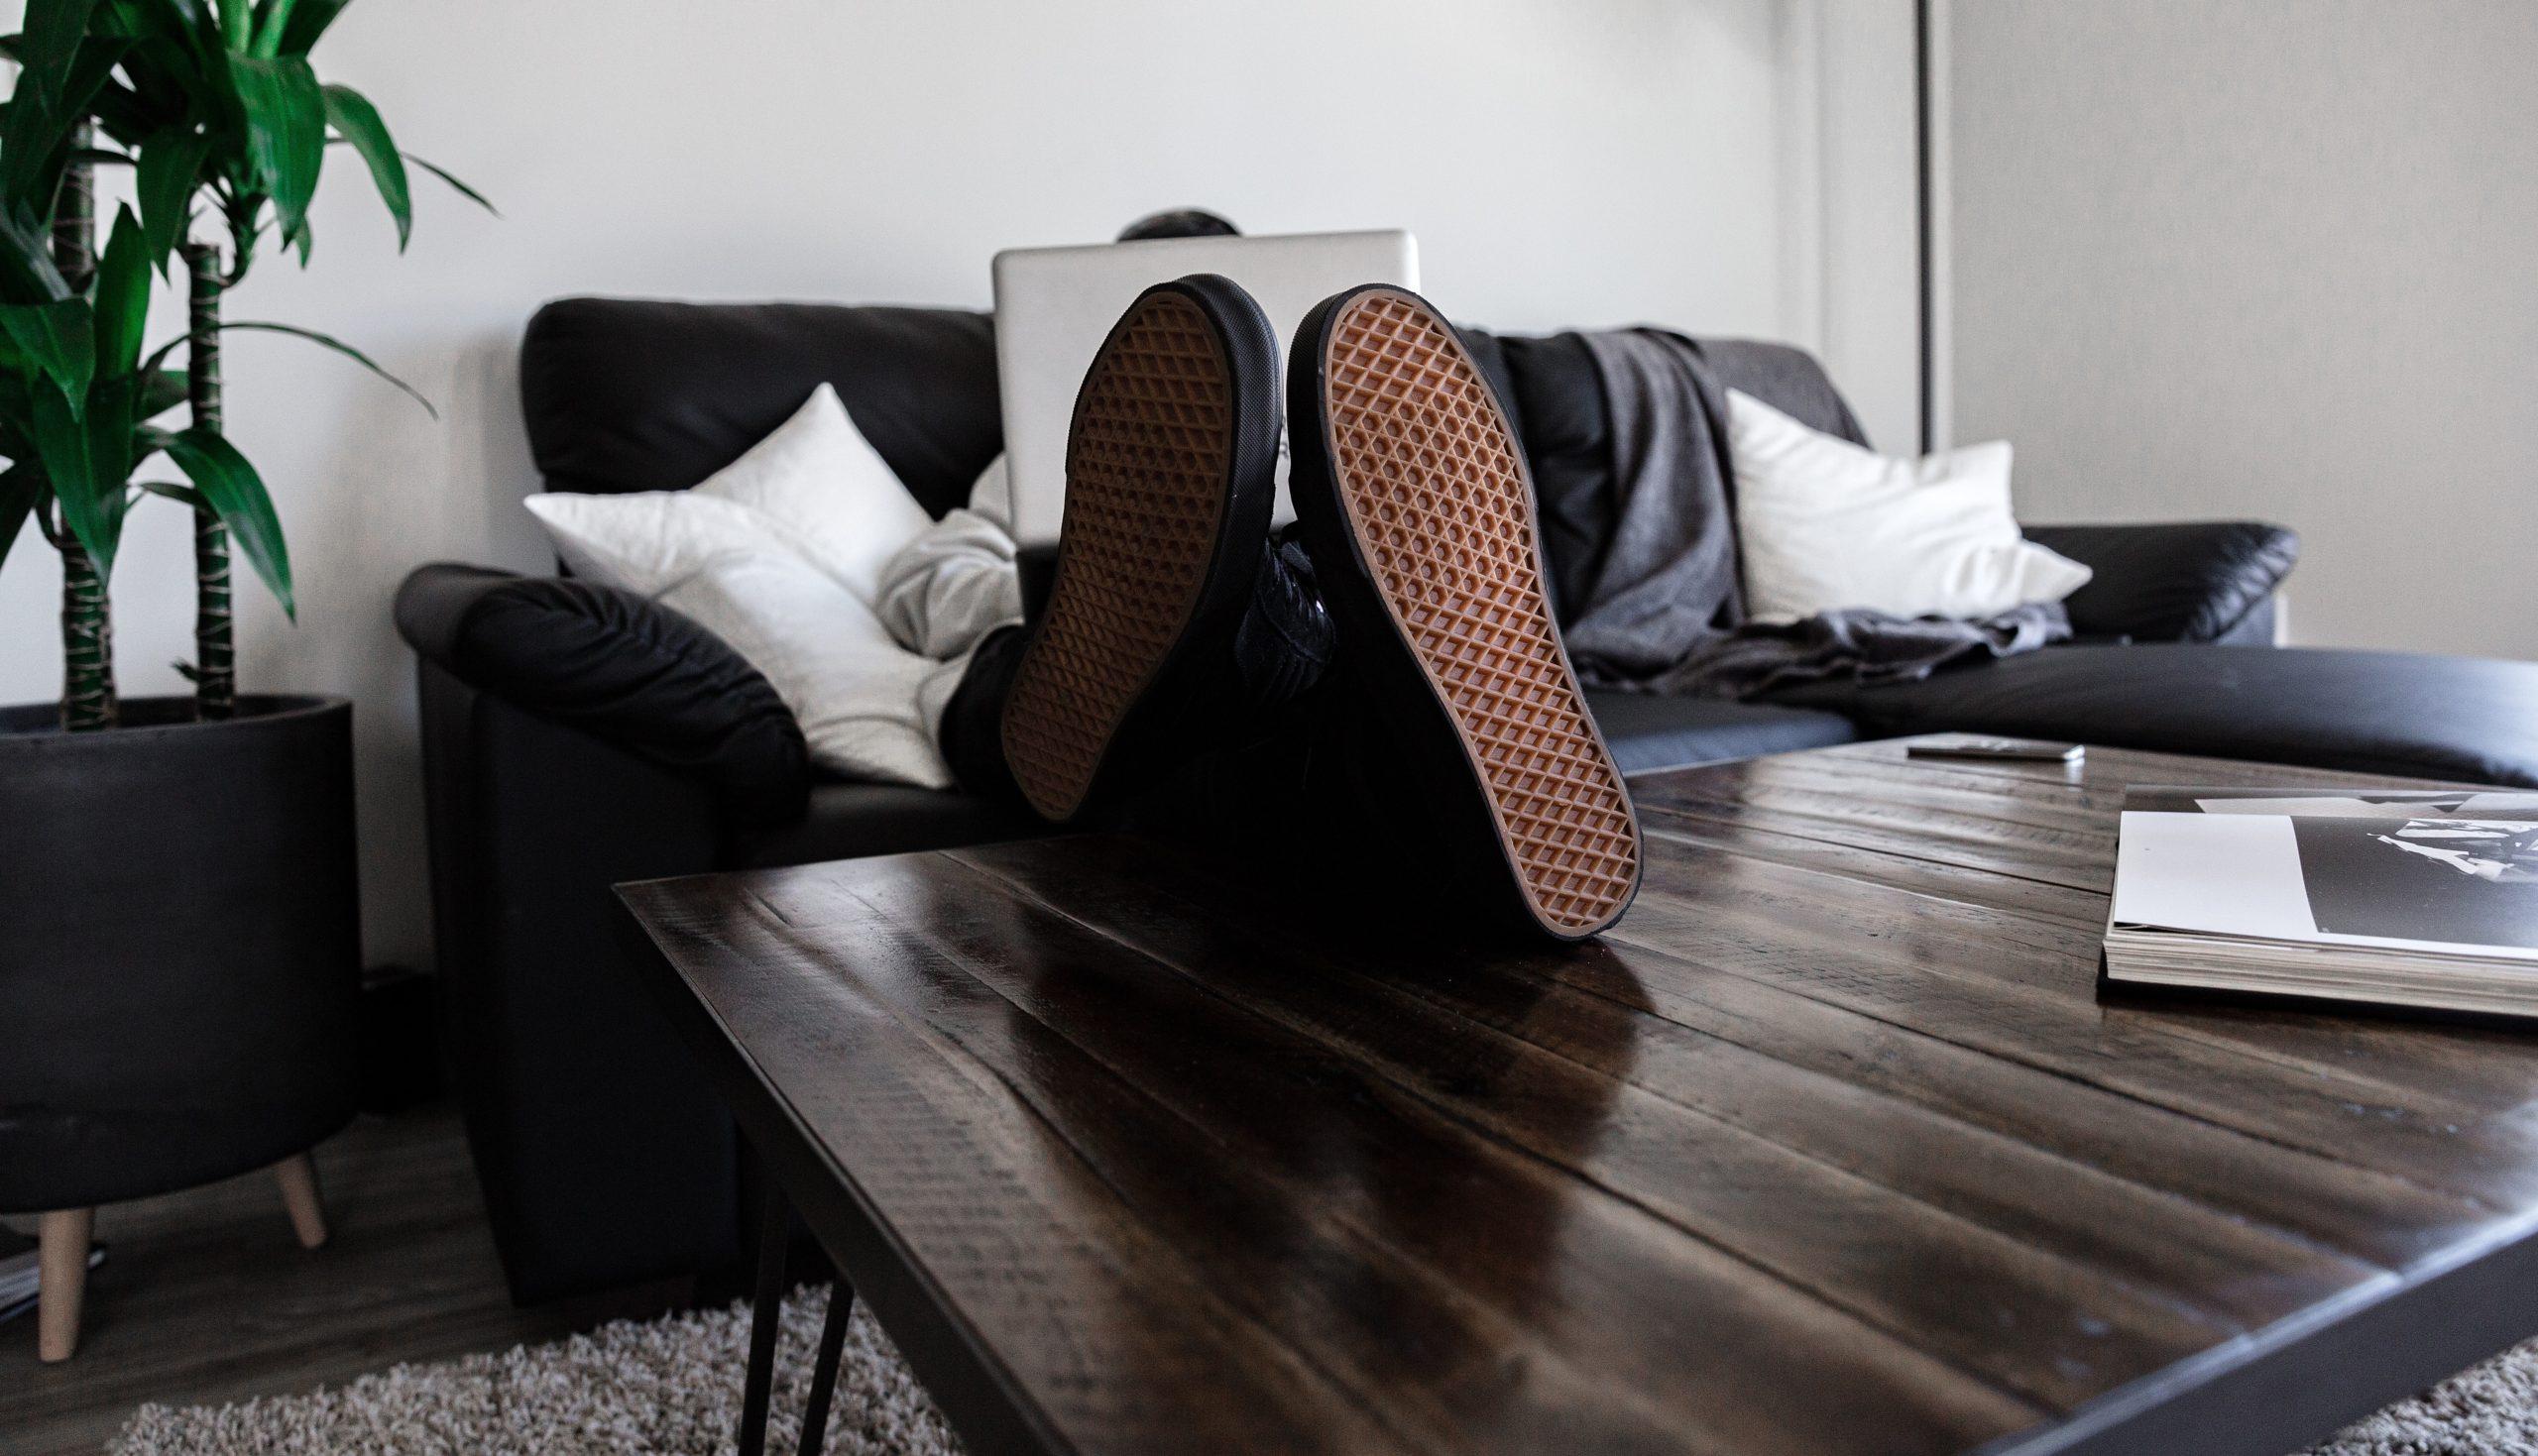 dillon shook 3iPKIXVXv U unsplash scaled - Leisurewear is the new black